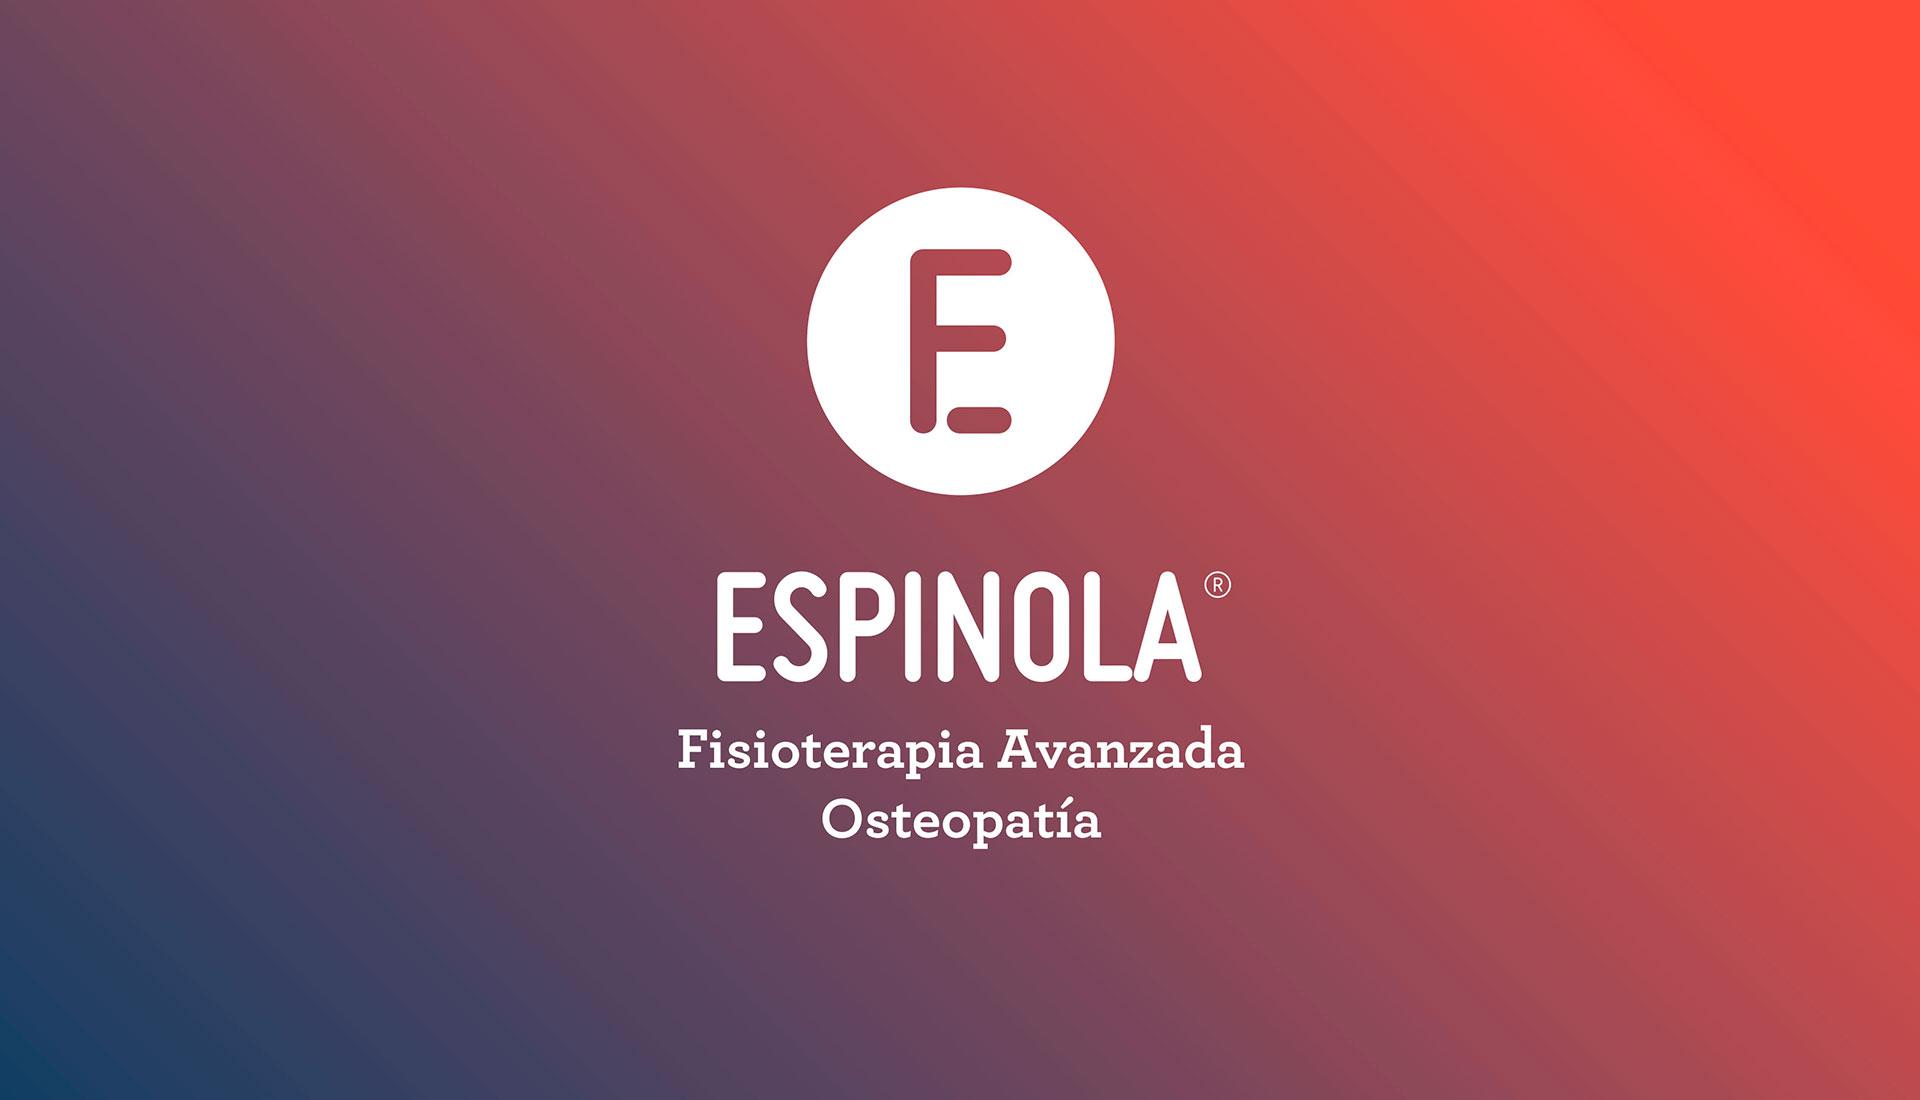 identidad-corporativa-agencia-publicidad-marketing-pennyworth-fisioterapia-osteopatia-alcasser-valencia-08